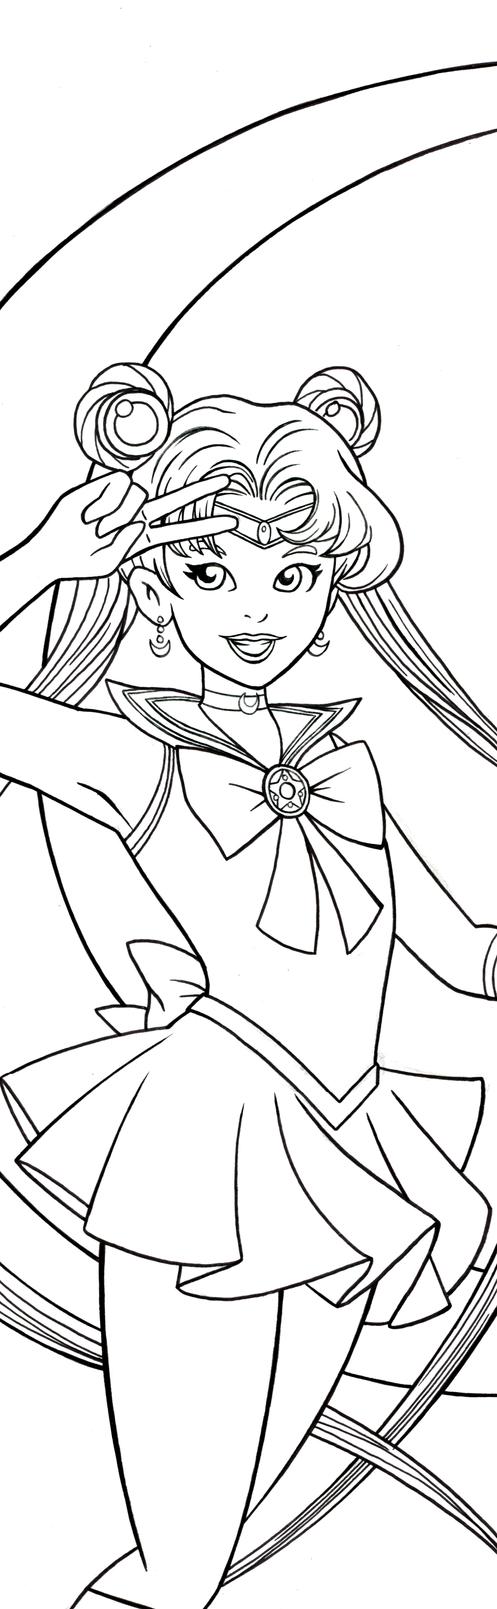 Sailor Moon Art Inks by RichBernatovech